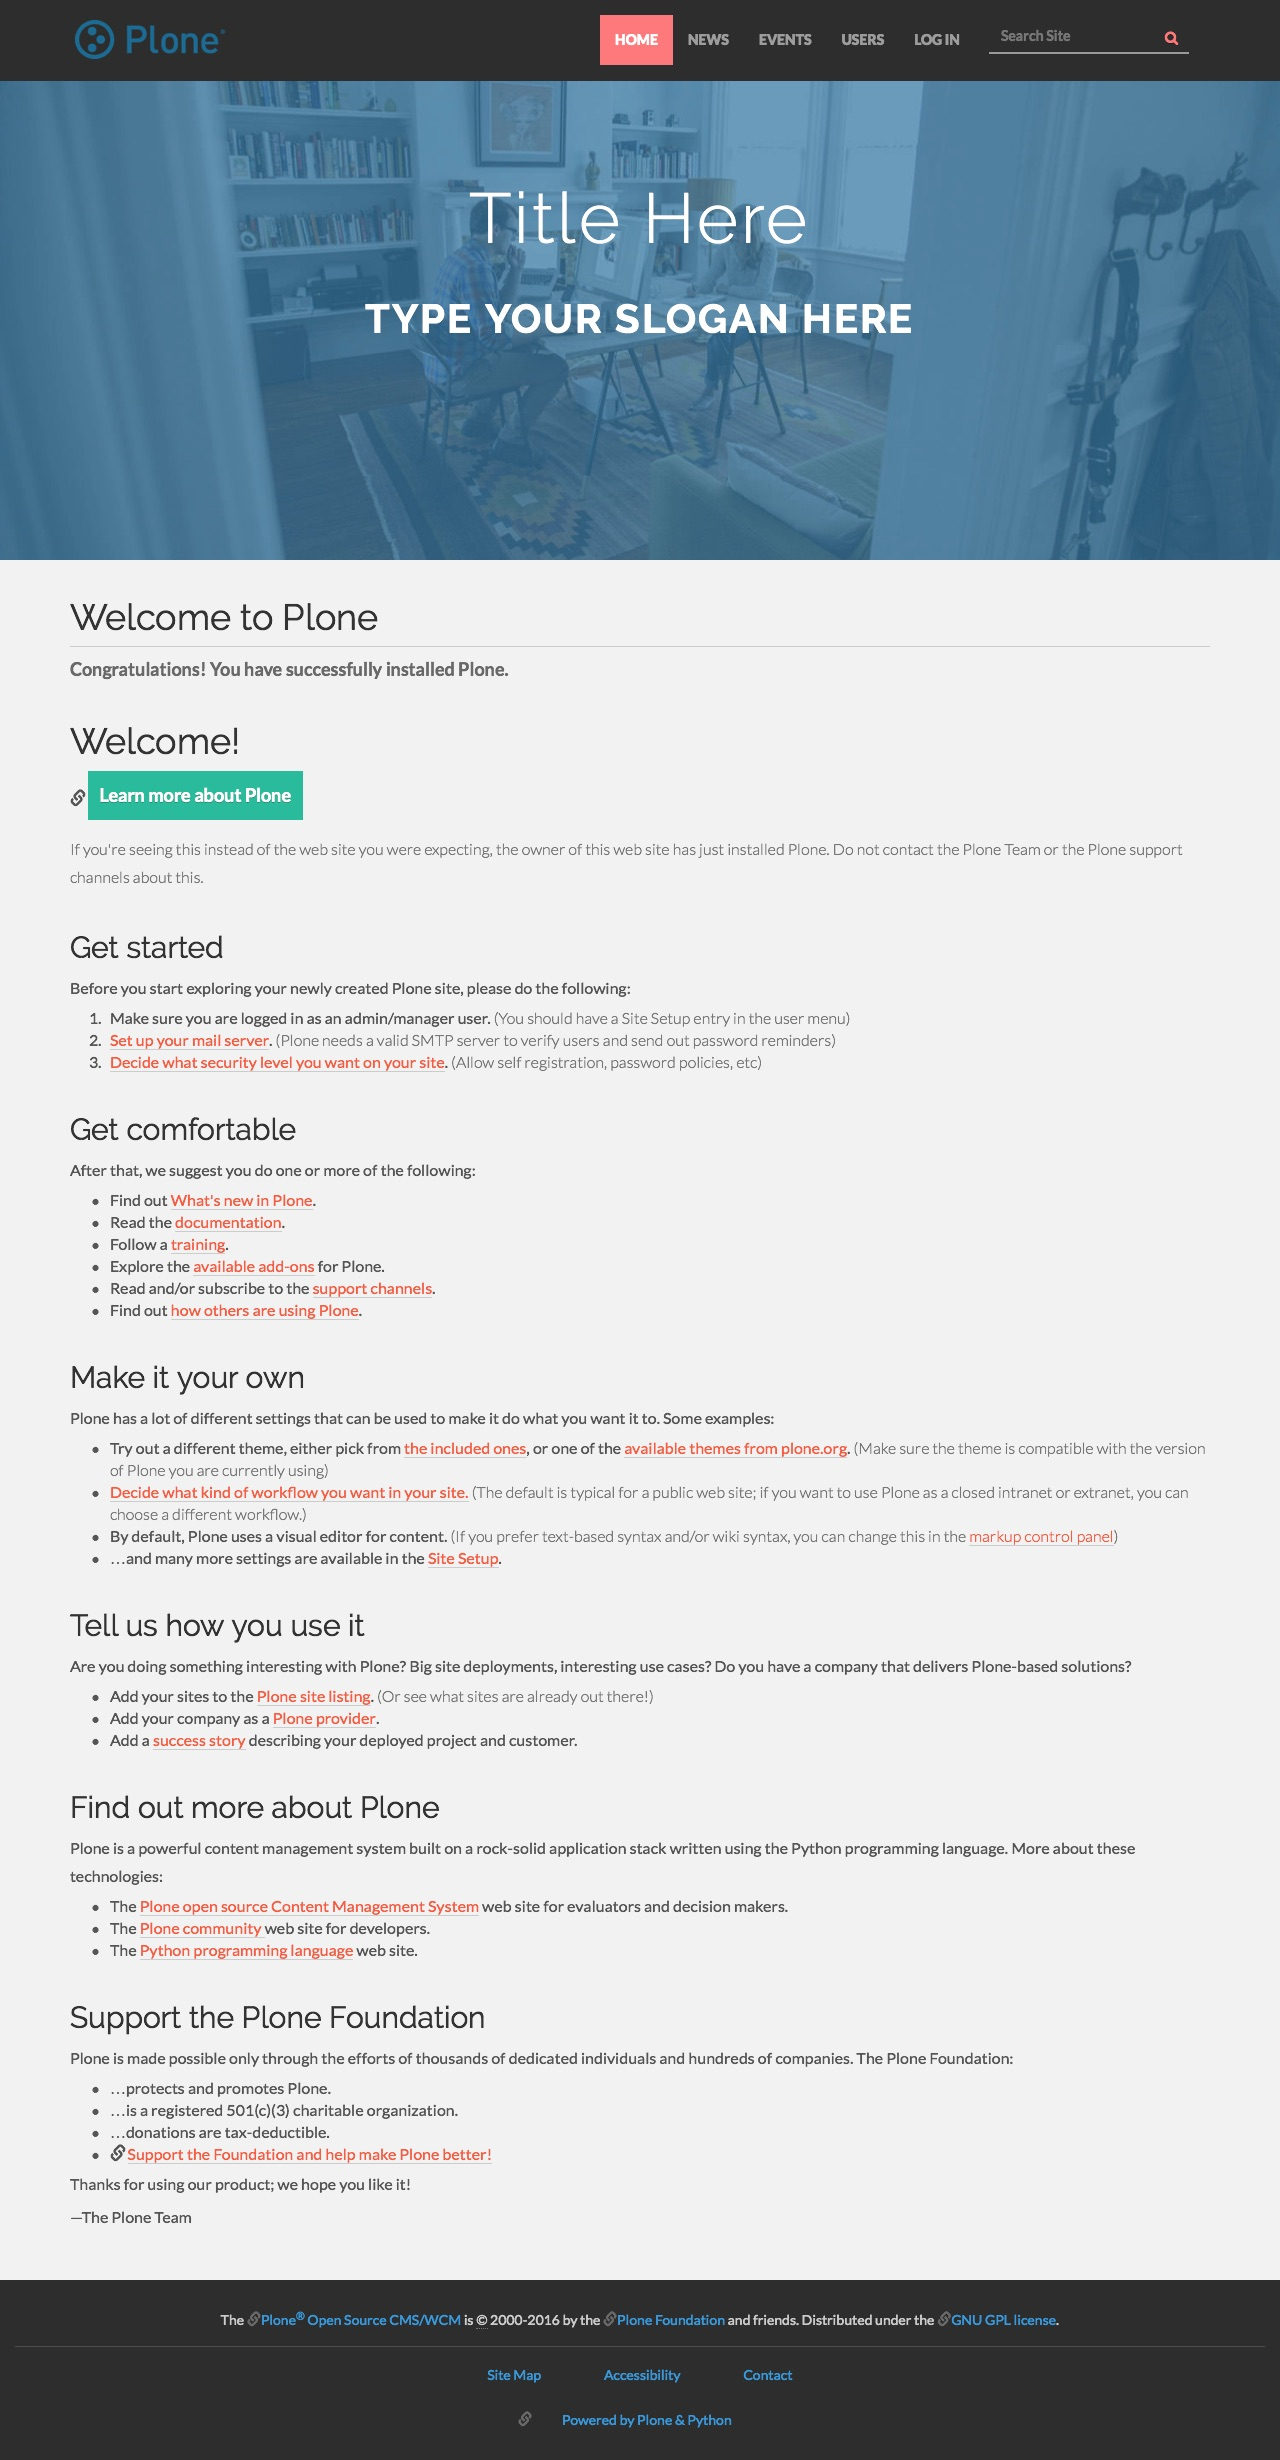 https://raw.githubusercontent.com/collective/plonetheme.spot/master/docs/plonetheme.spot-screenshot.jpg